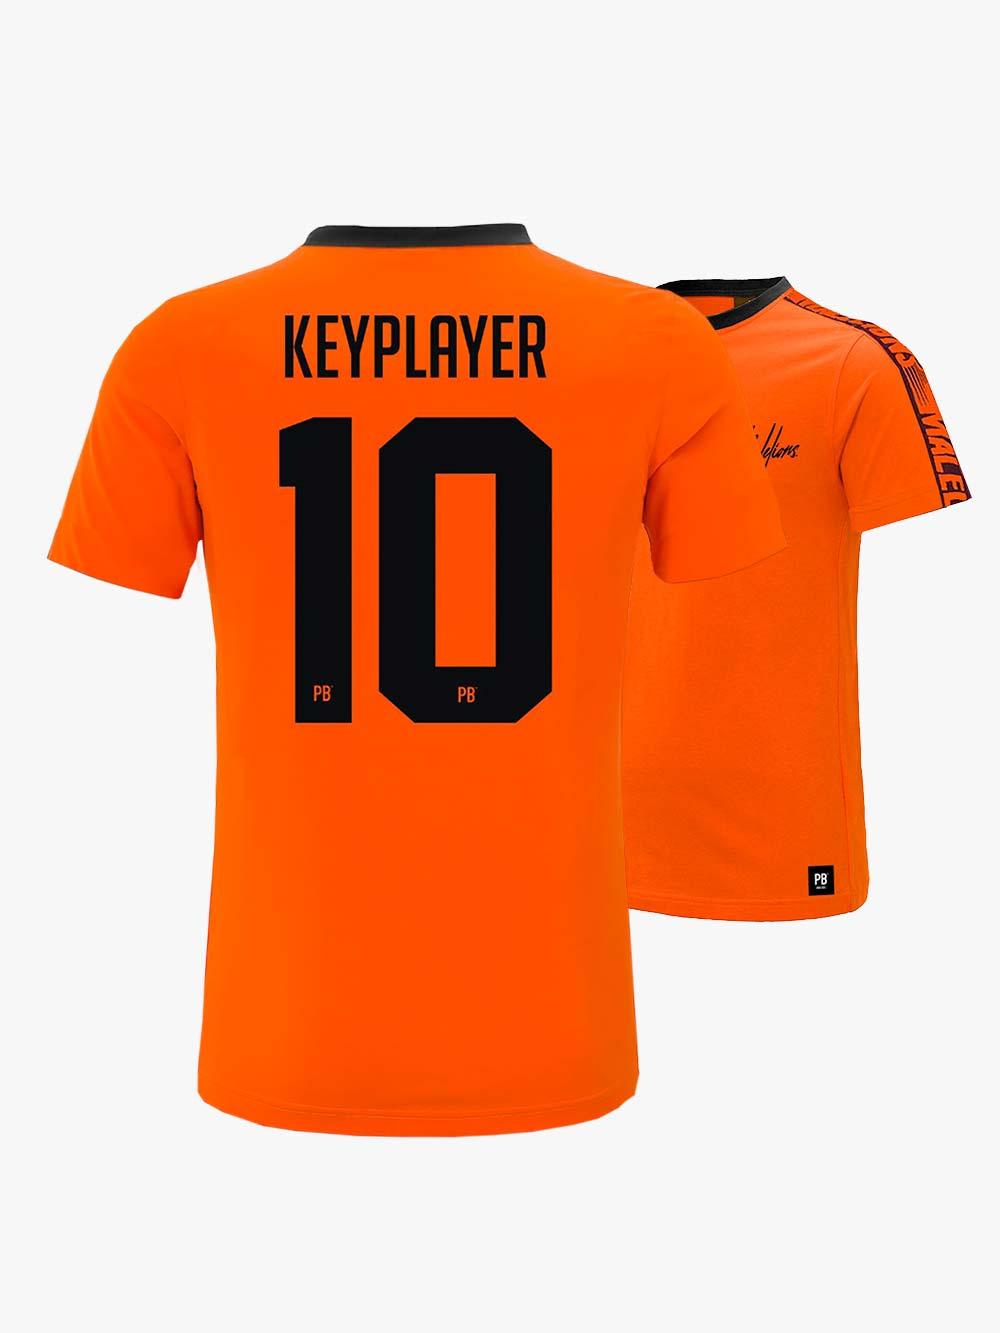 Malelions-10-Keyplayer-EK2021-shirt